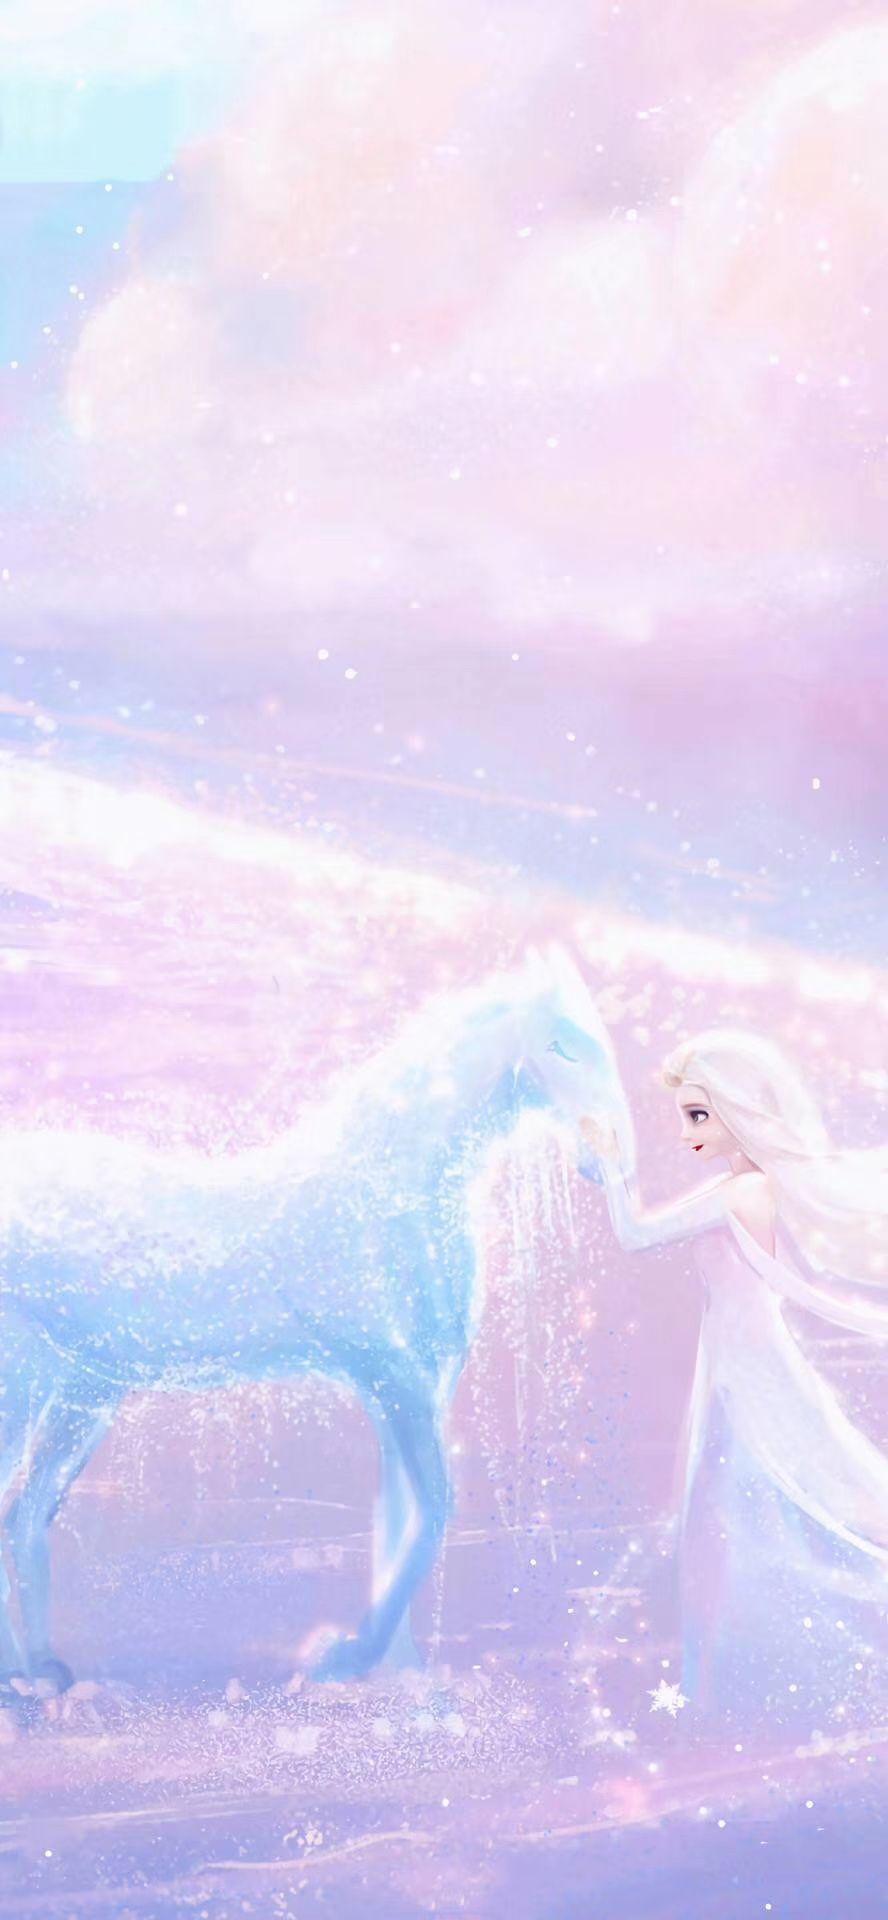 Frozen Wallpaper Frozen Wallpaper Wallpaper Iphone Disney Princess Disney Background